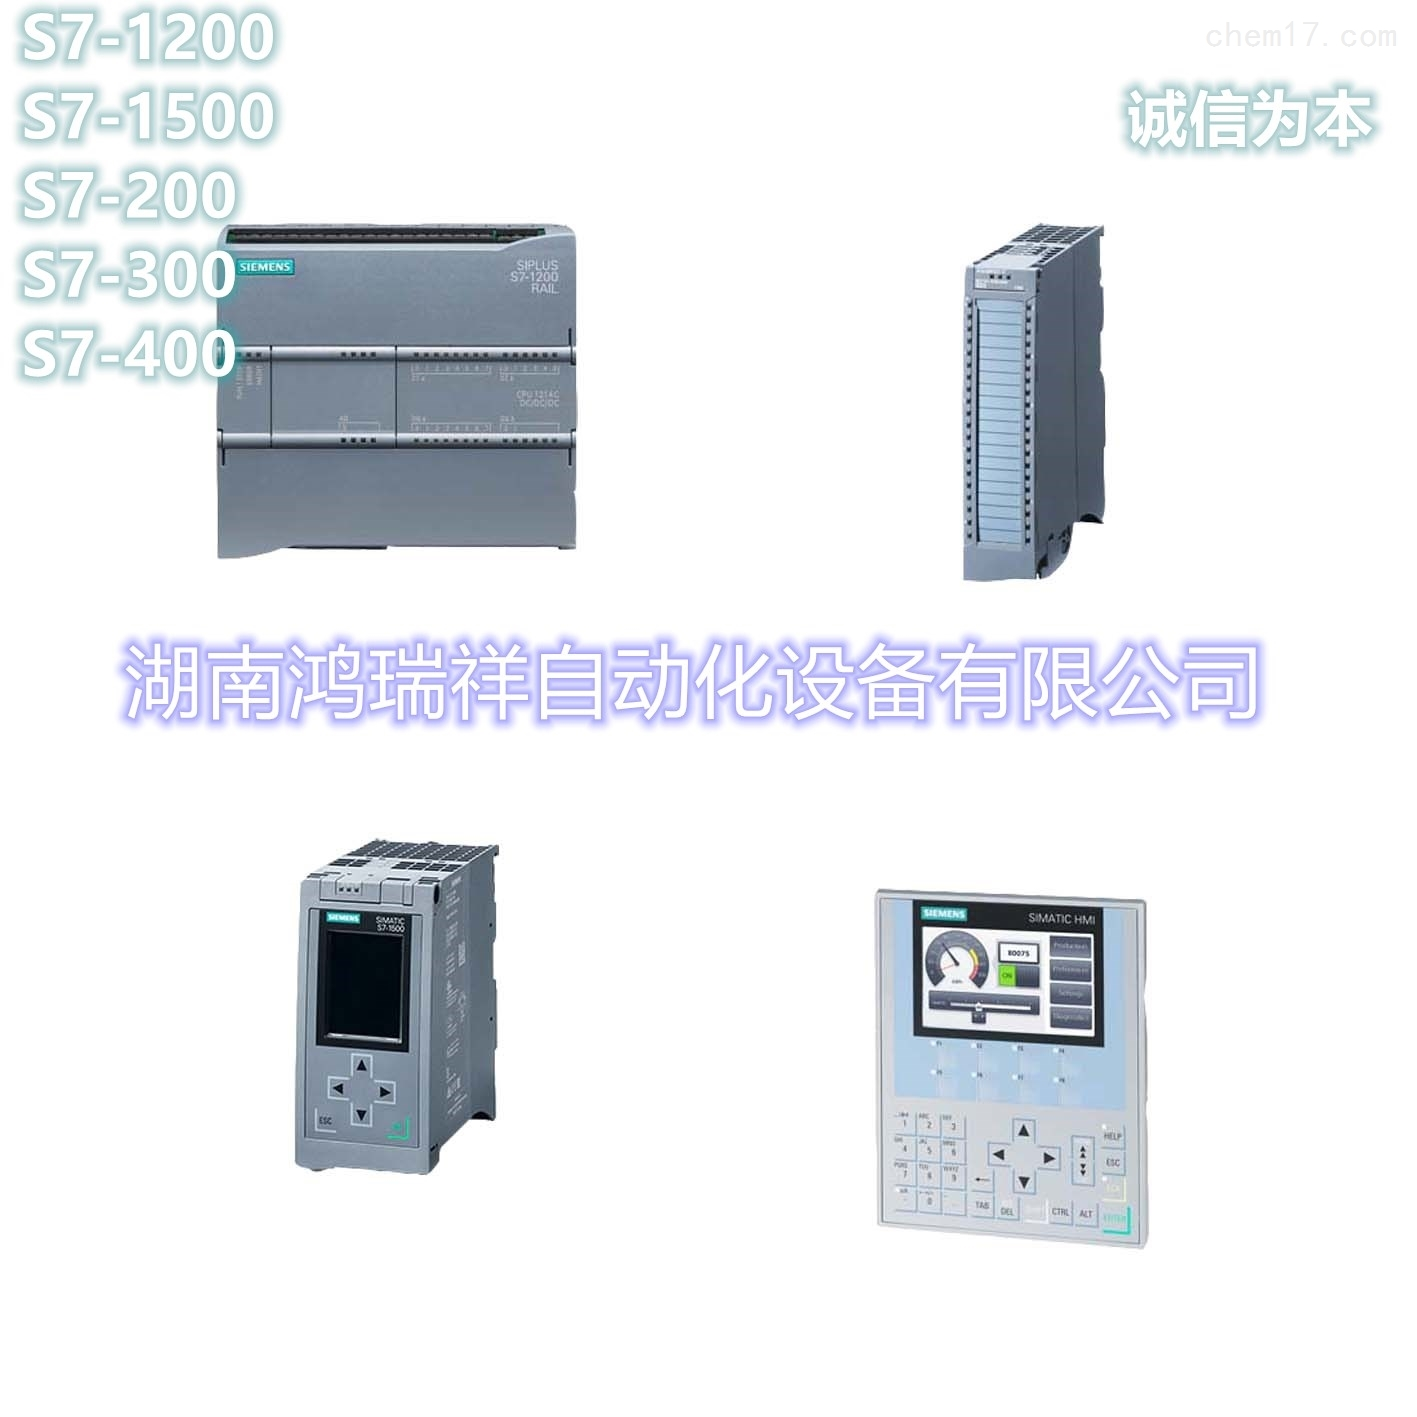 供应6ES7517-3AP00-0AB0